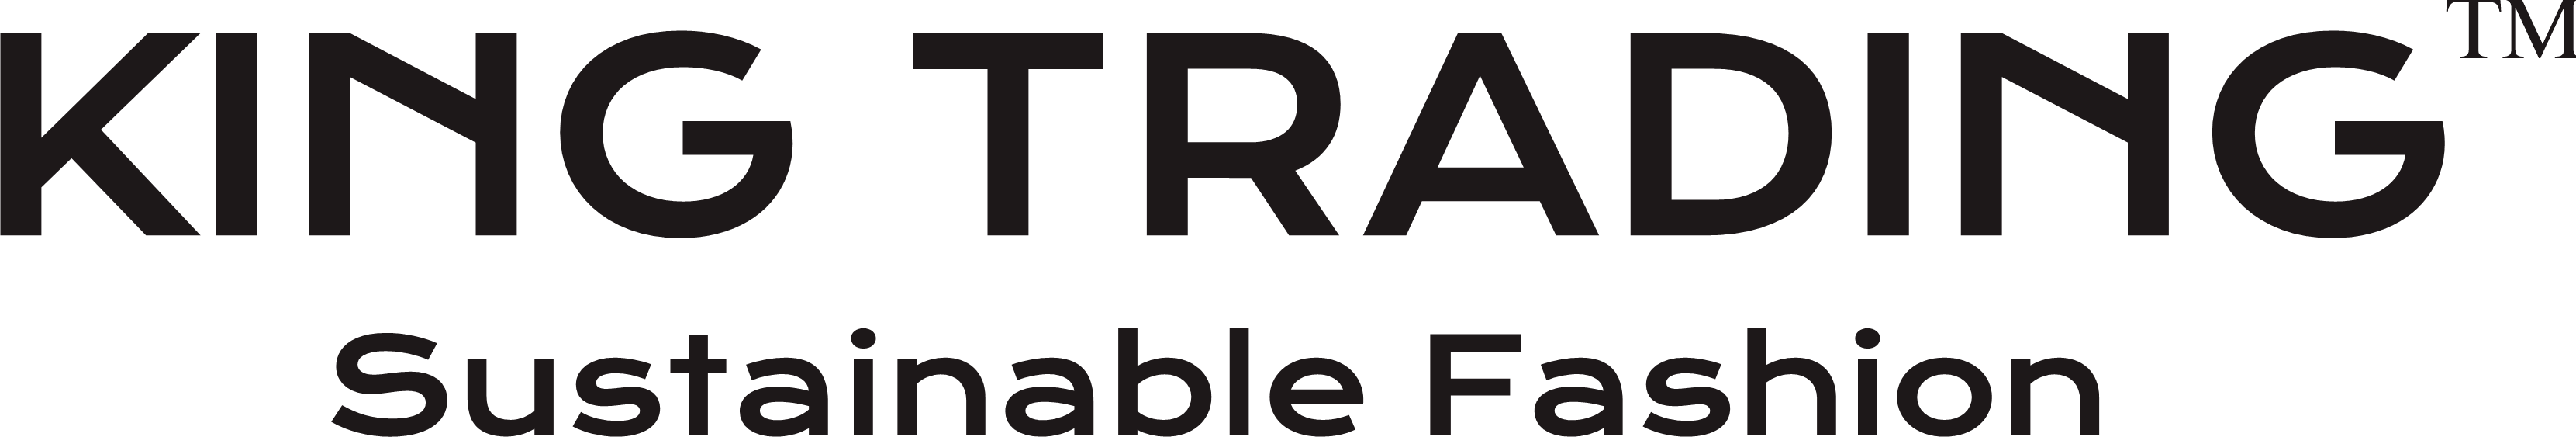 logo kingtrading